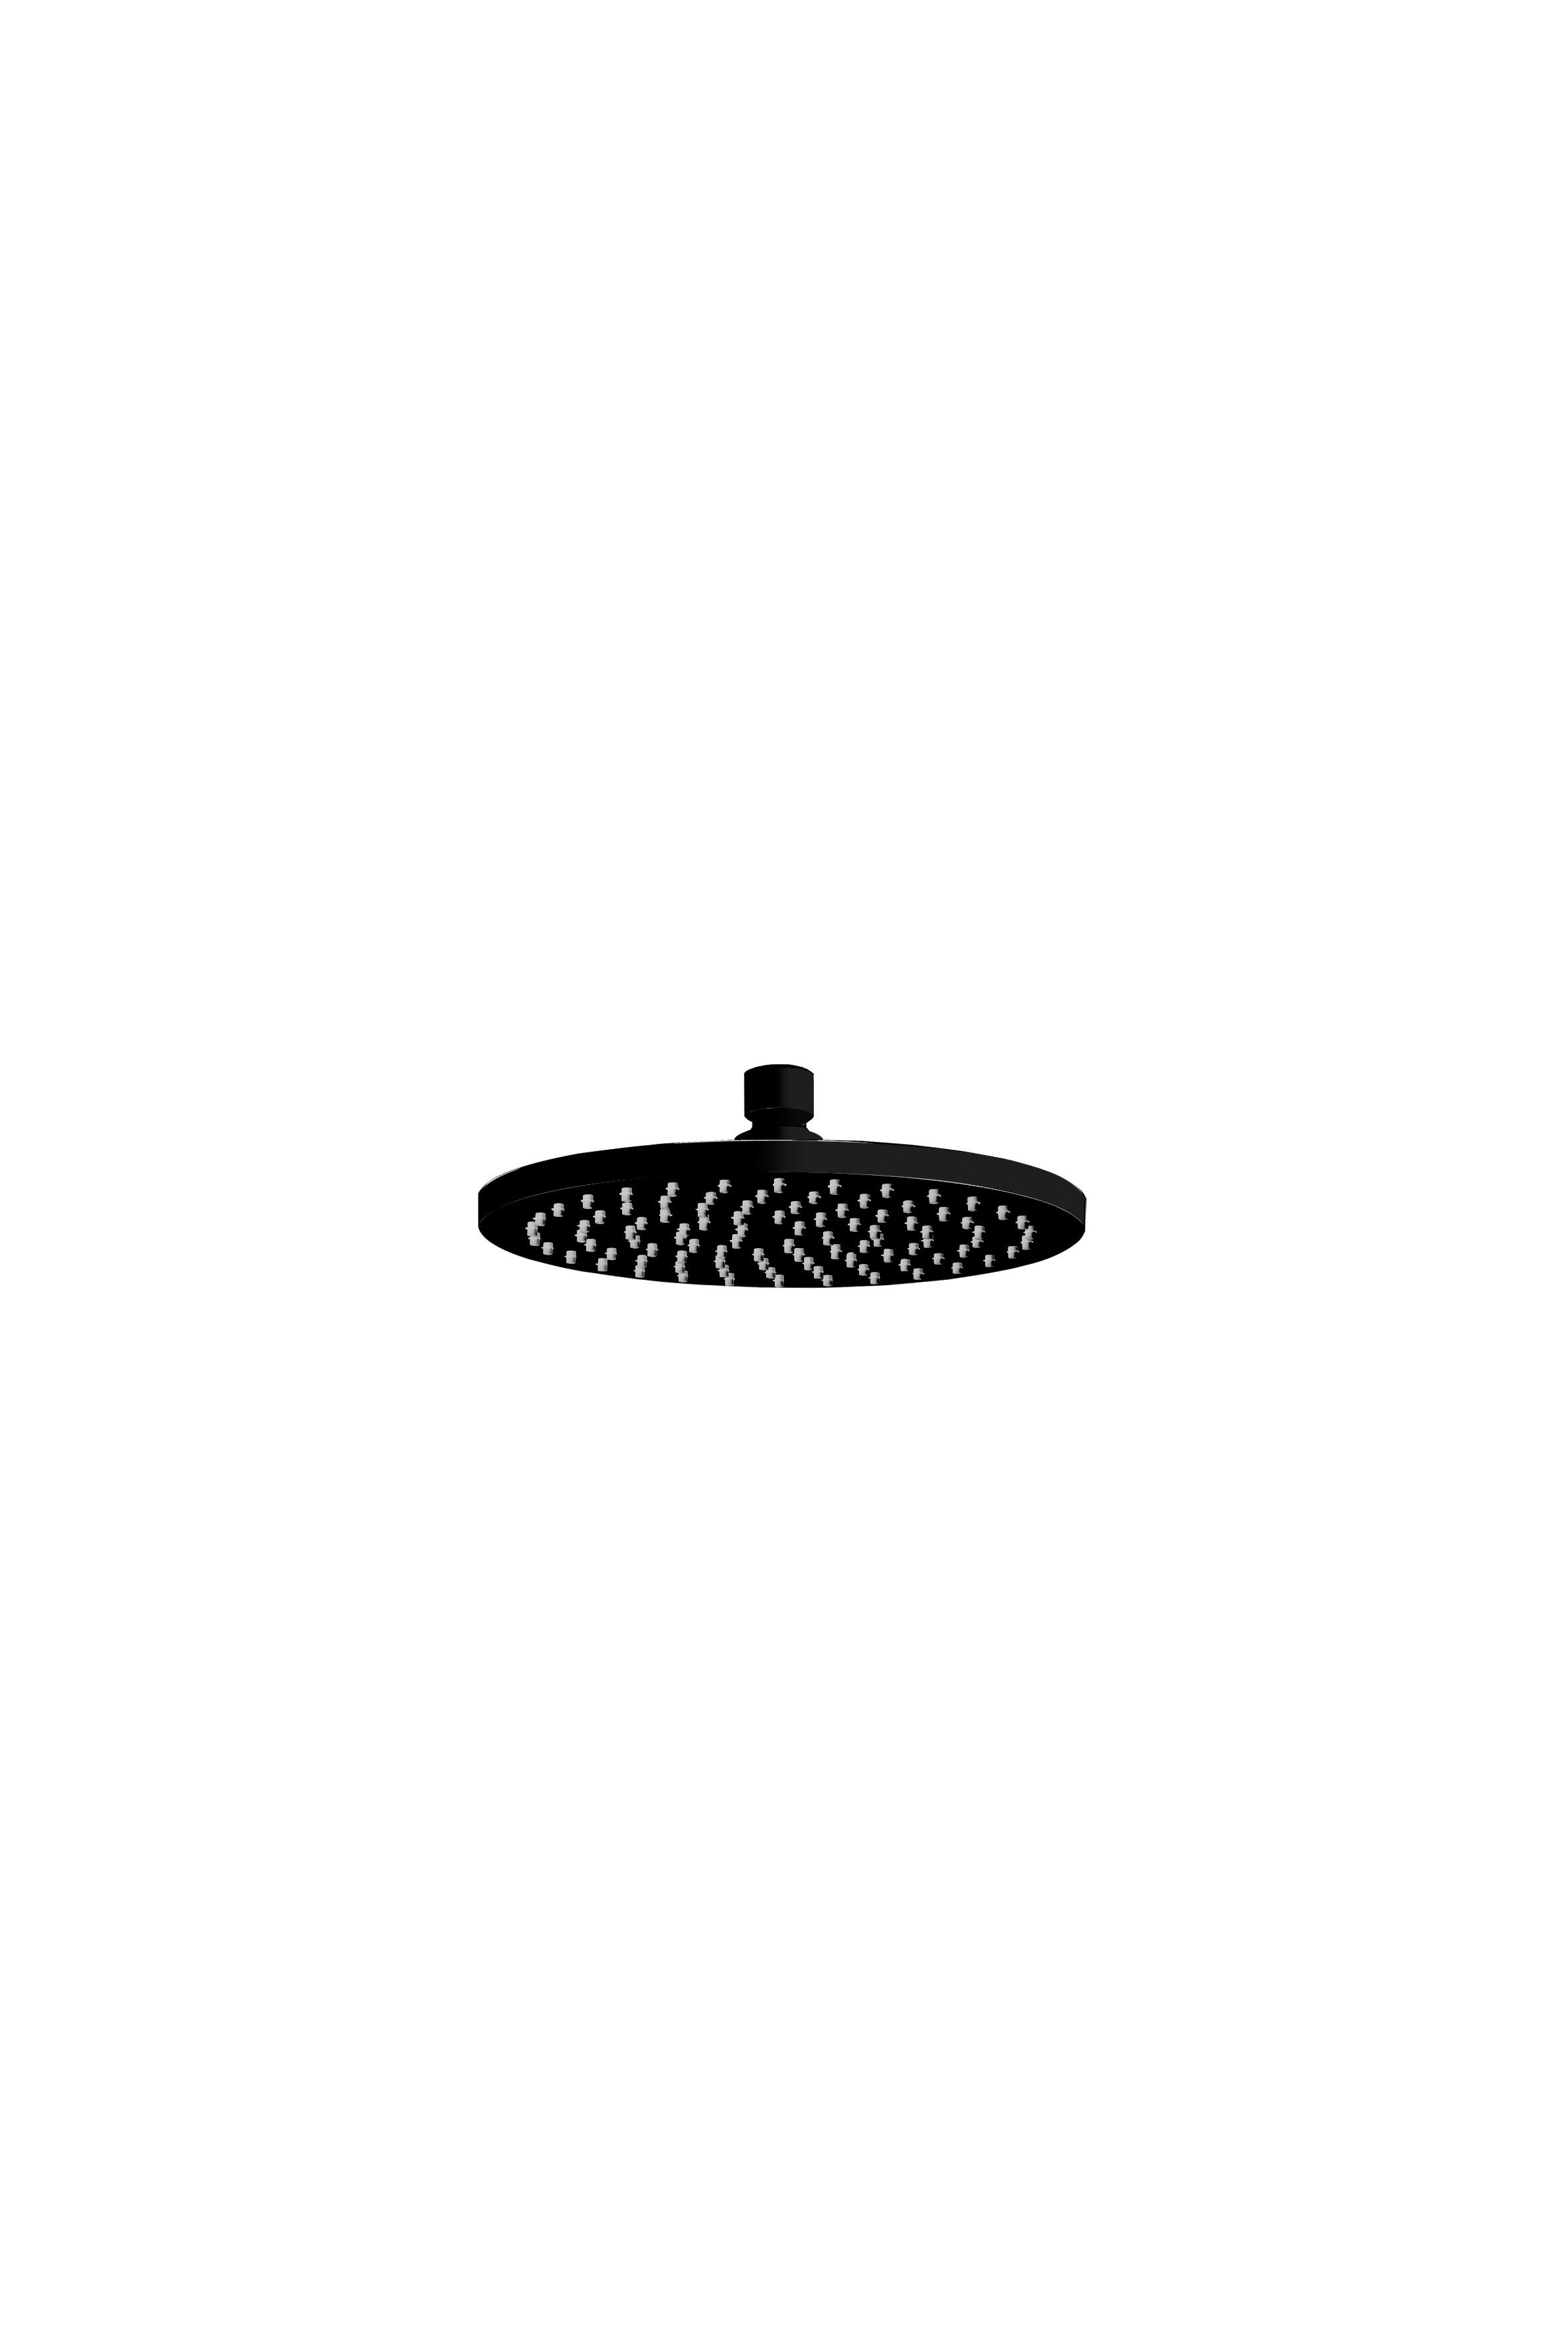 Bonomi 200mm Dia Round Shower Head